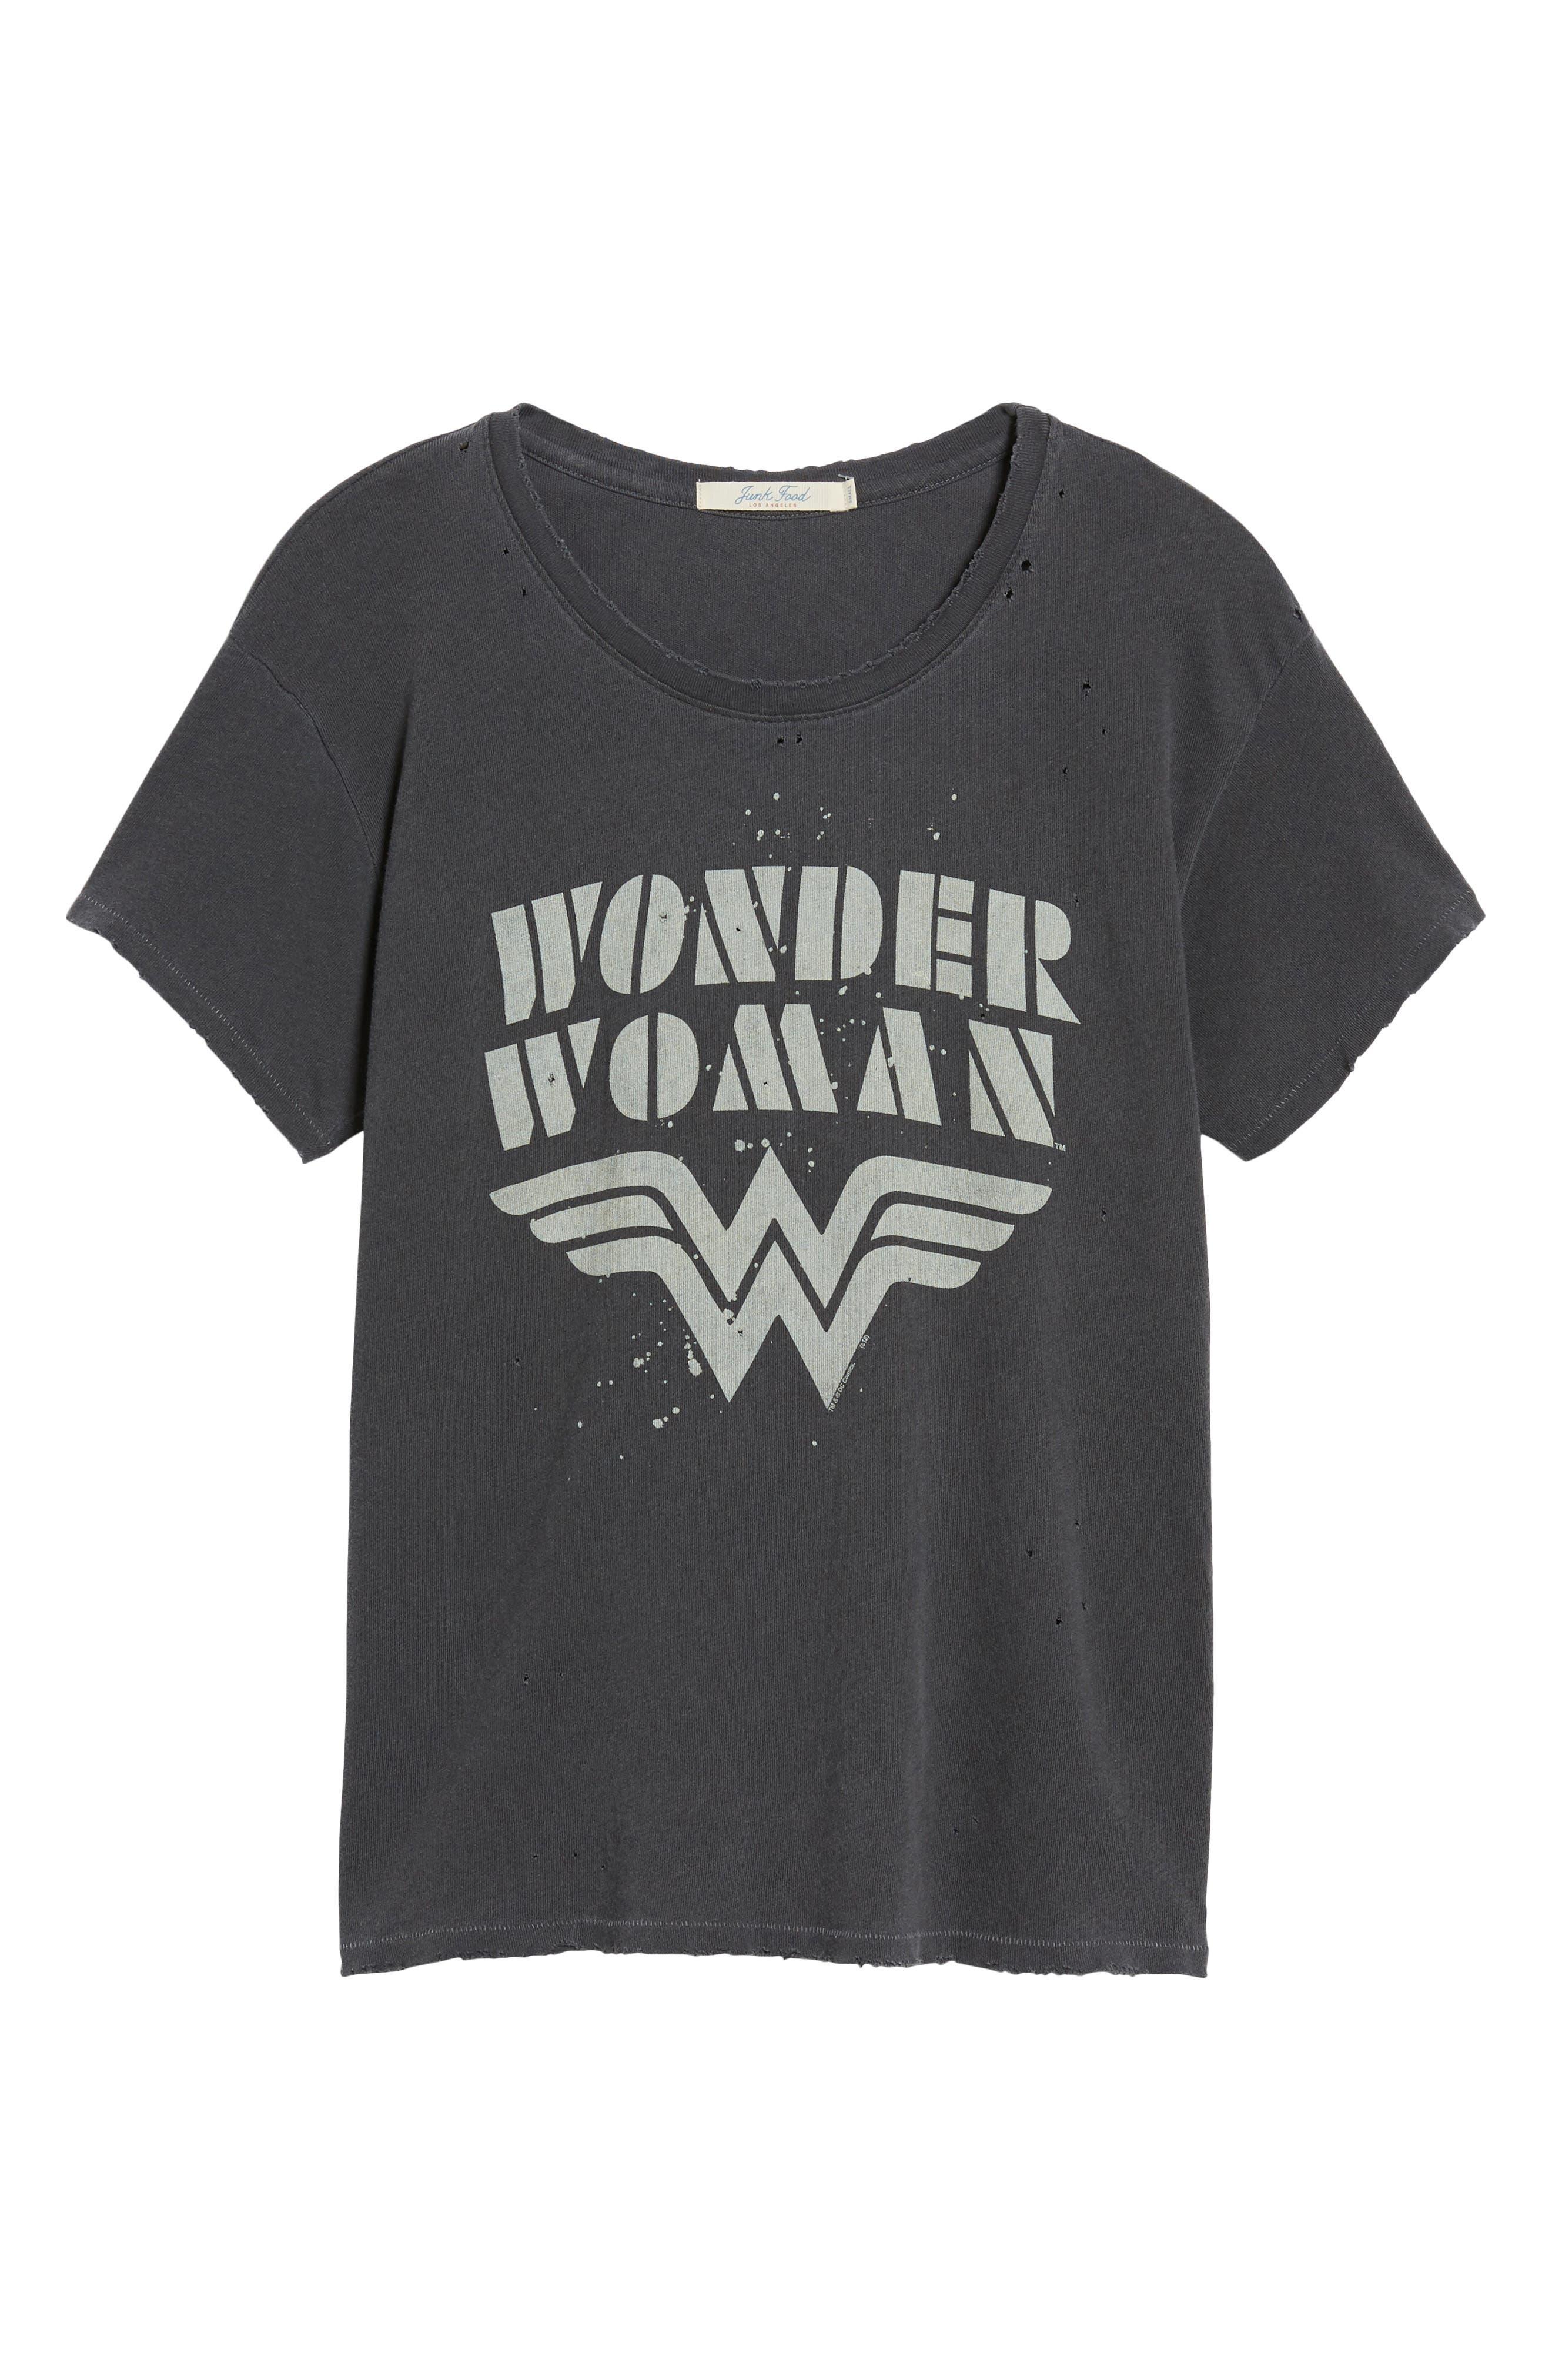 Wonder Woman Tee,                             Alternate thumbnail 7, color,                             Vintage Black